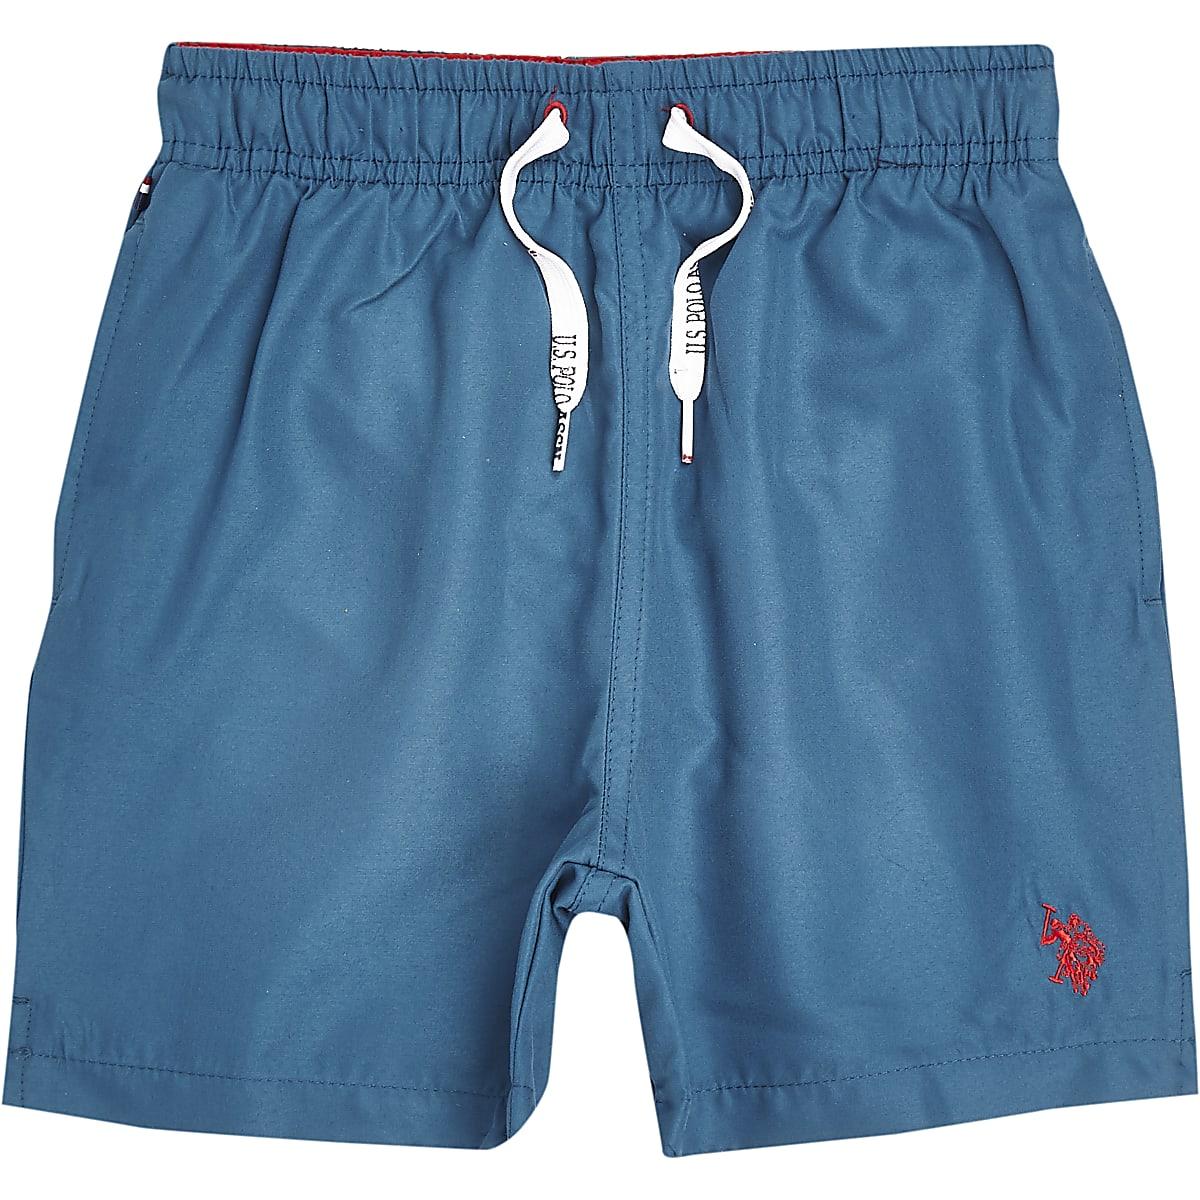 4e75c8200034 Boys blue U.S. Polo Assn. swim shorts - Swim Shorts - boys